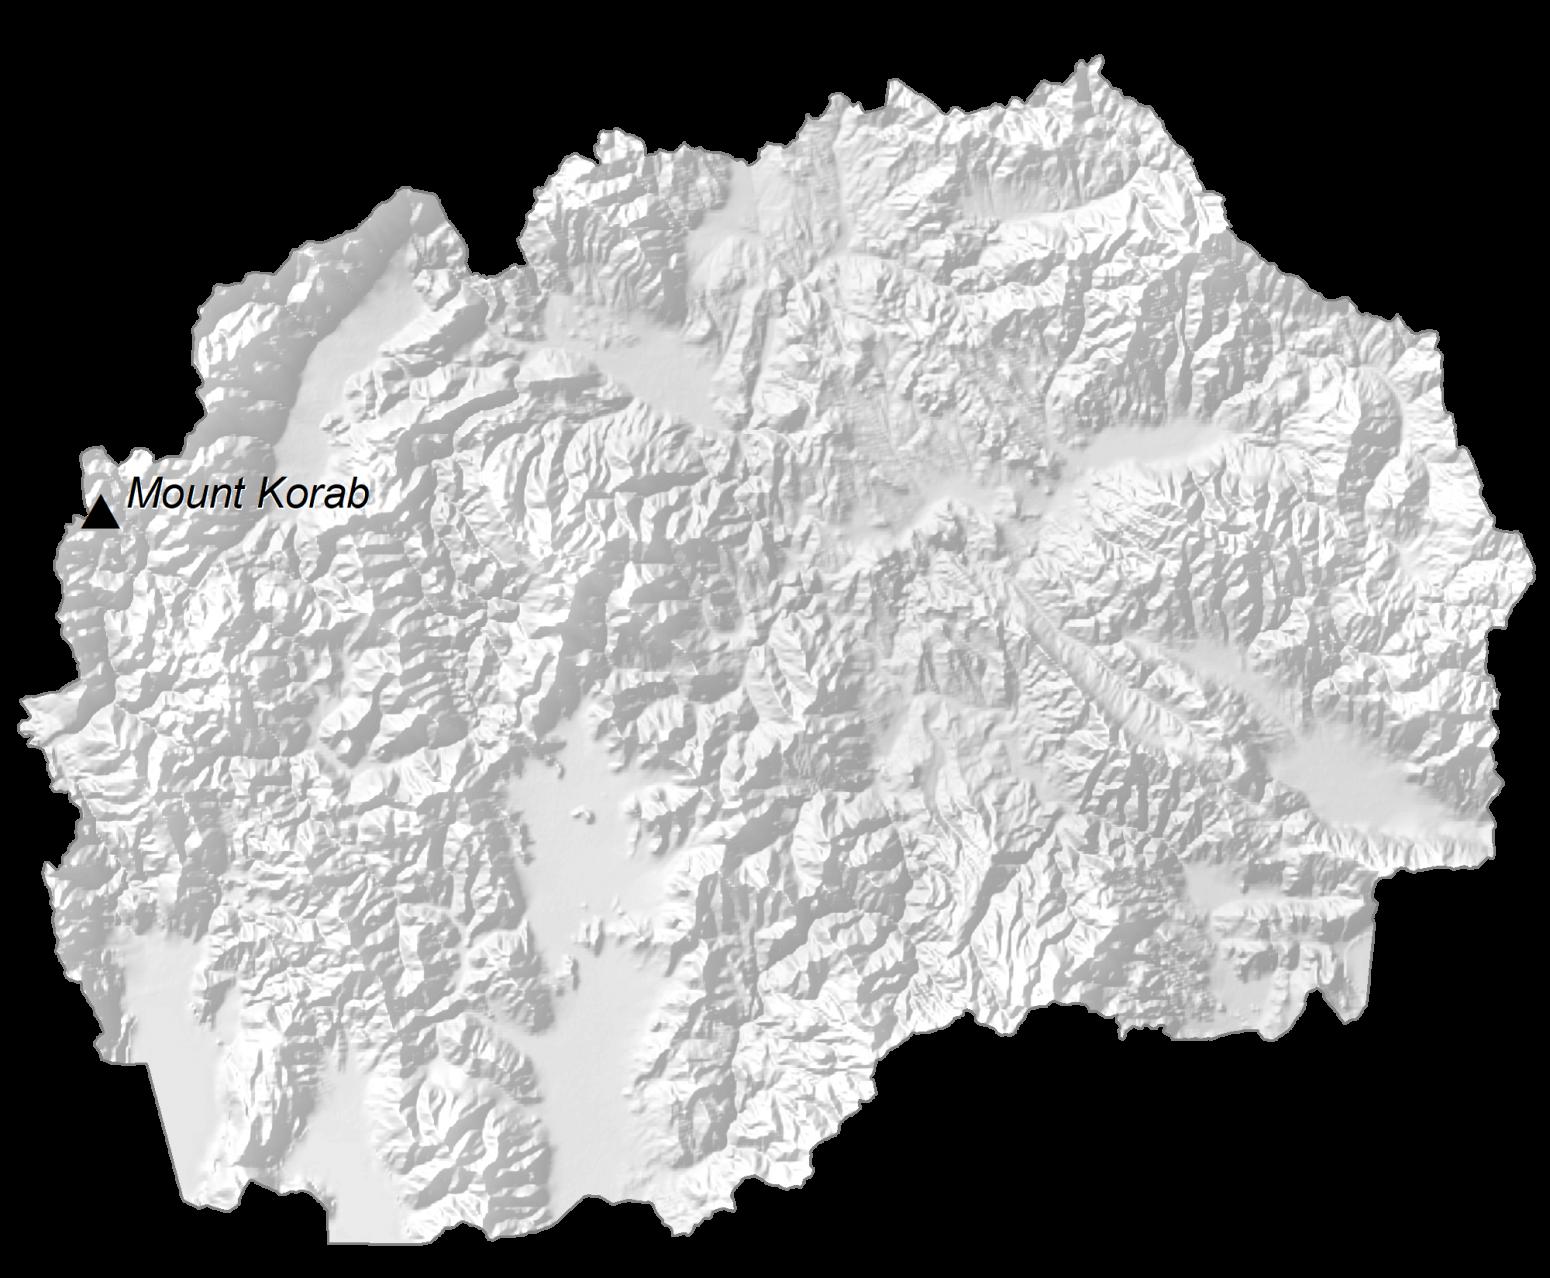 North Macedonia Elevation Map